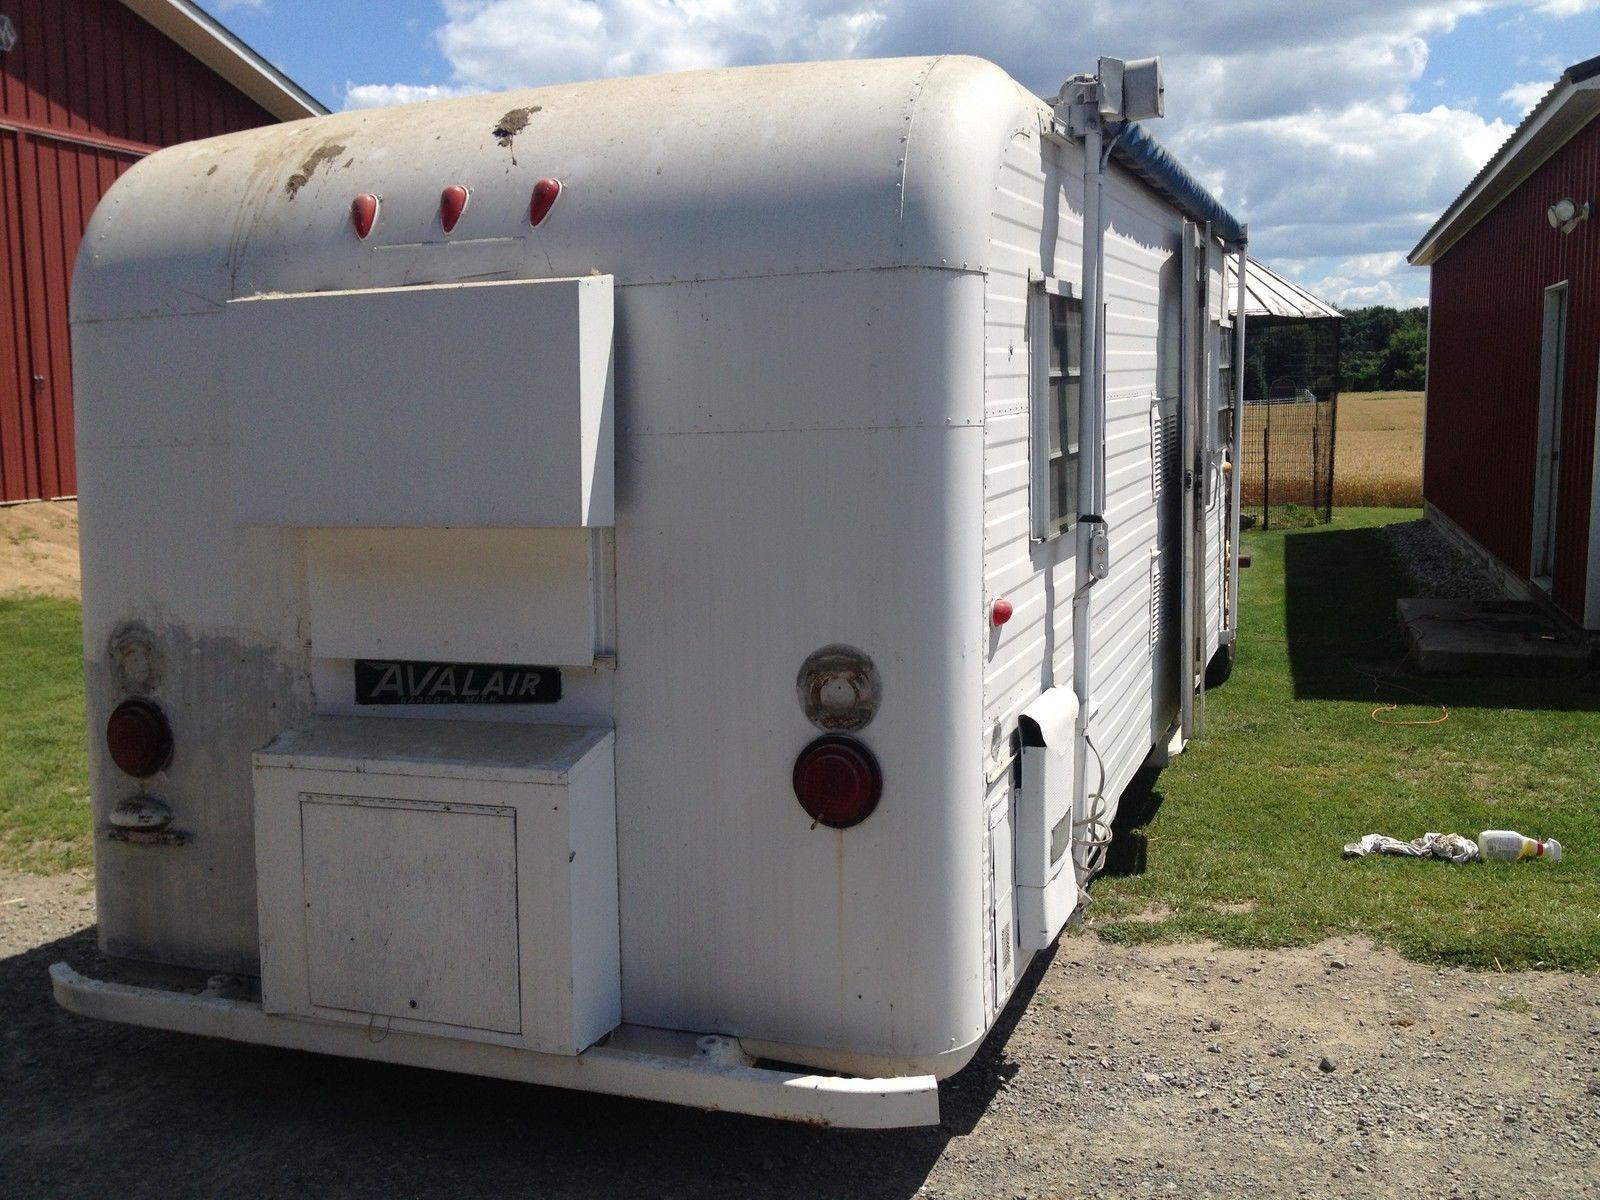 Rare 1963 Avalair Vintage Camper Travel Trailer Baroda Michigan